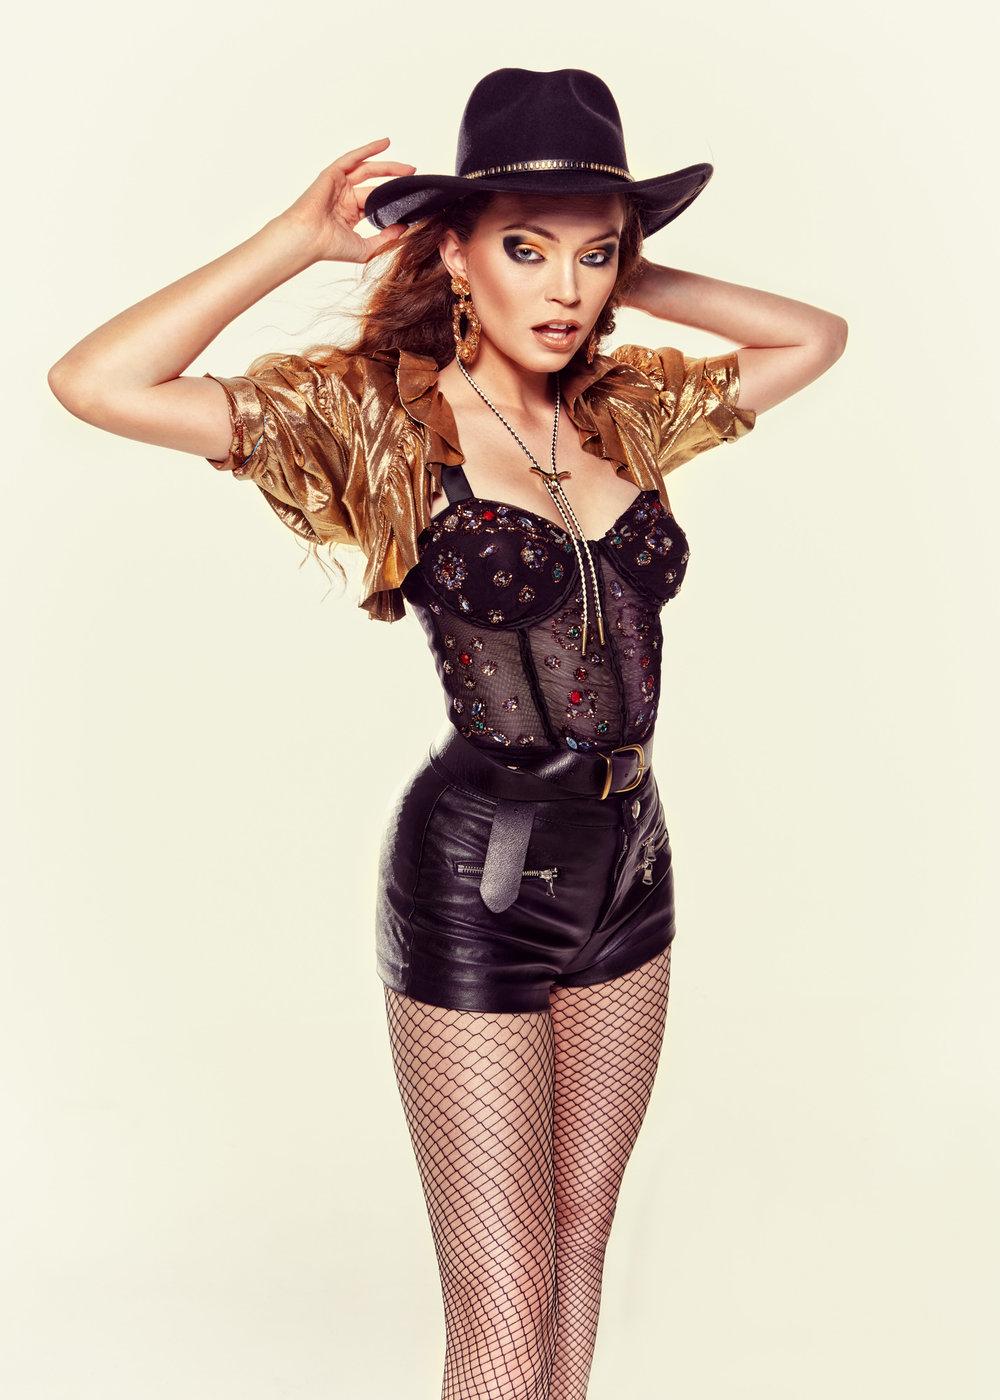 FashionEditorial_LeighLithgow.jpg